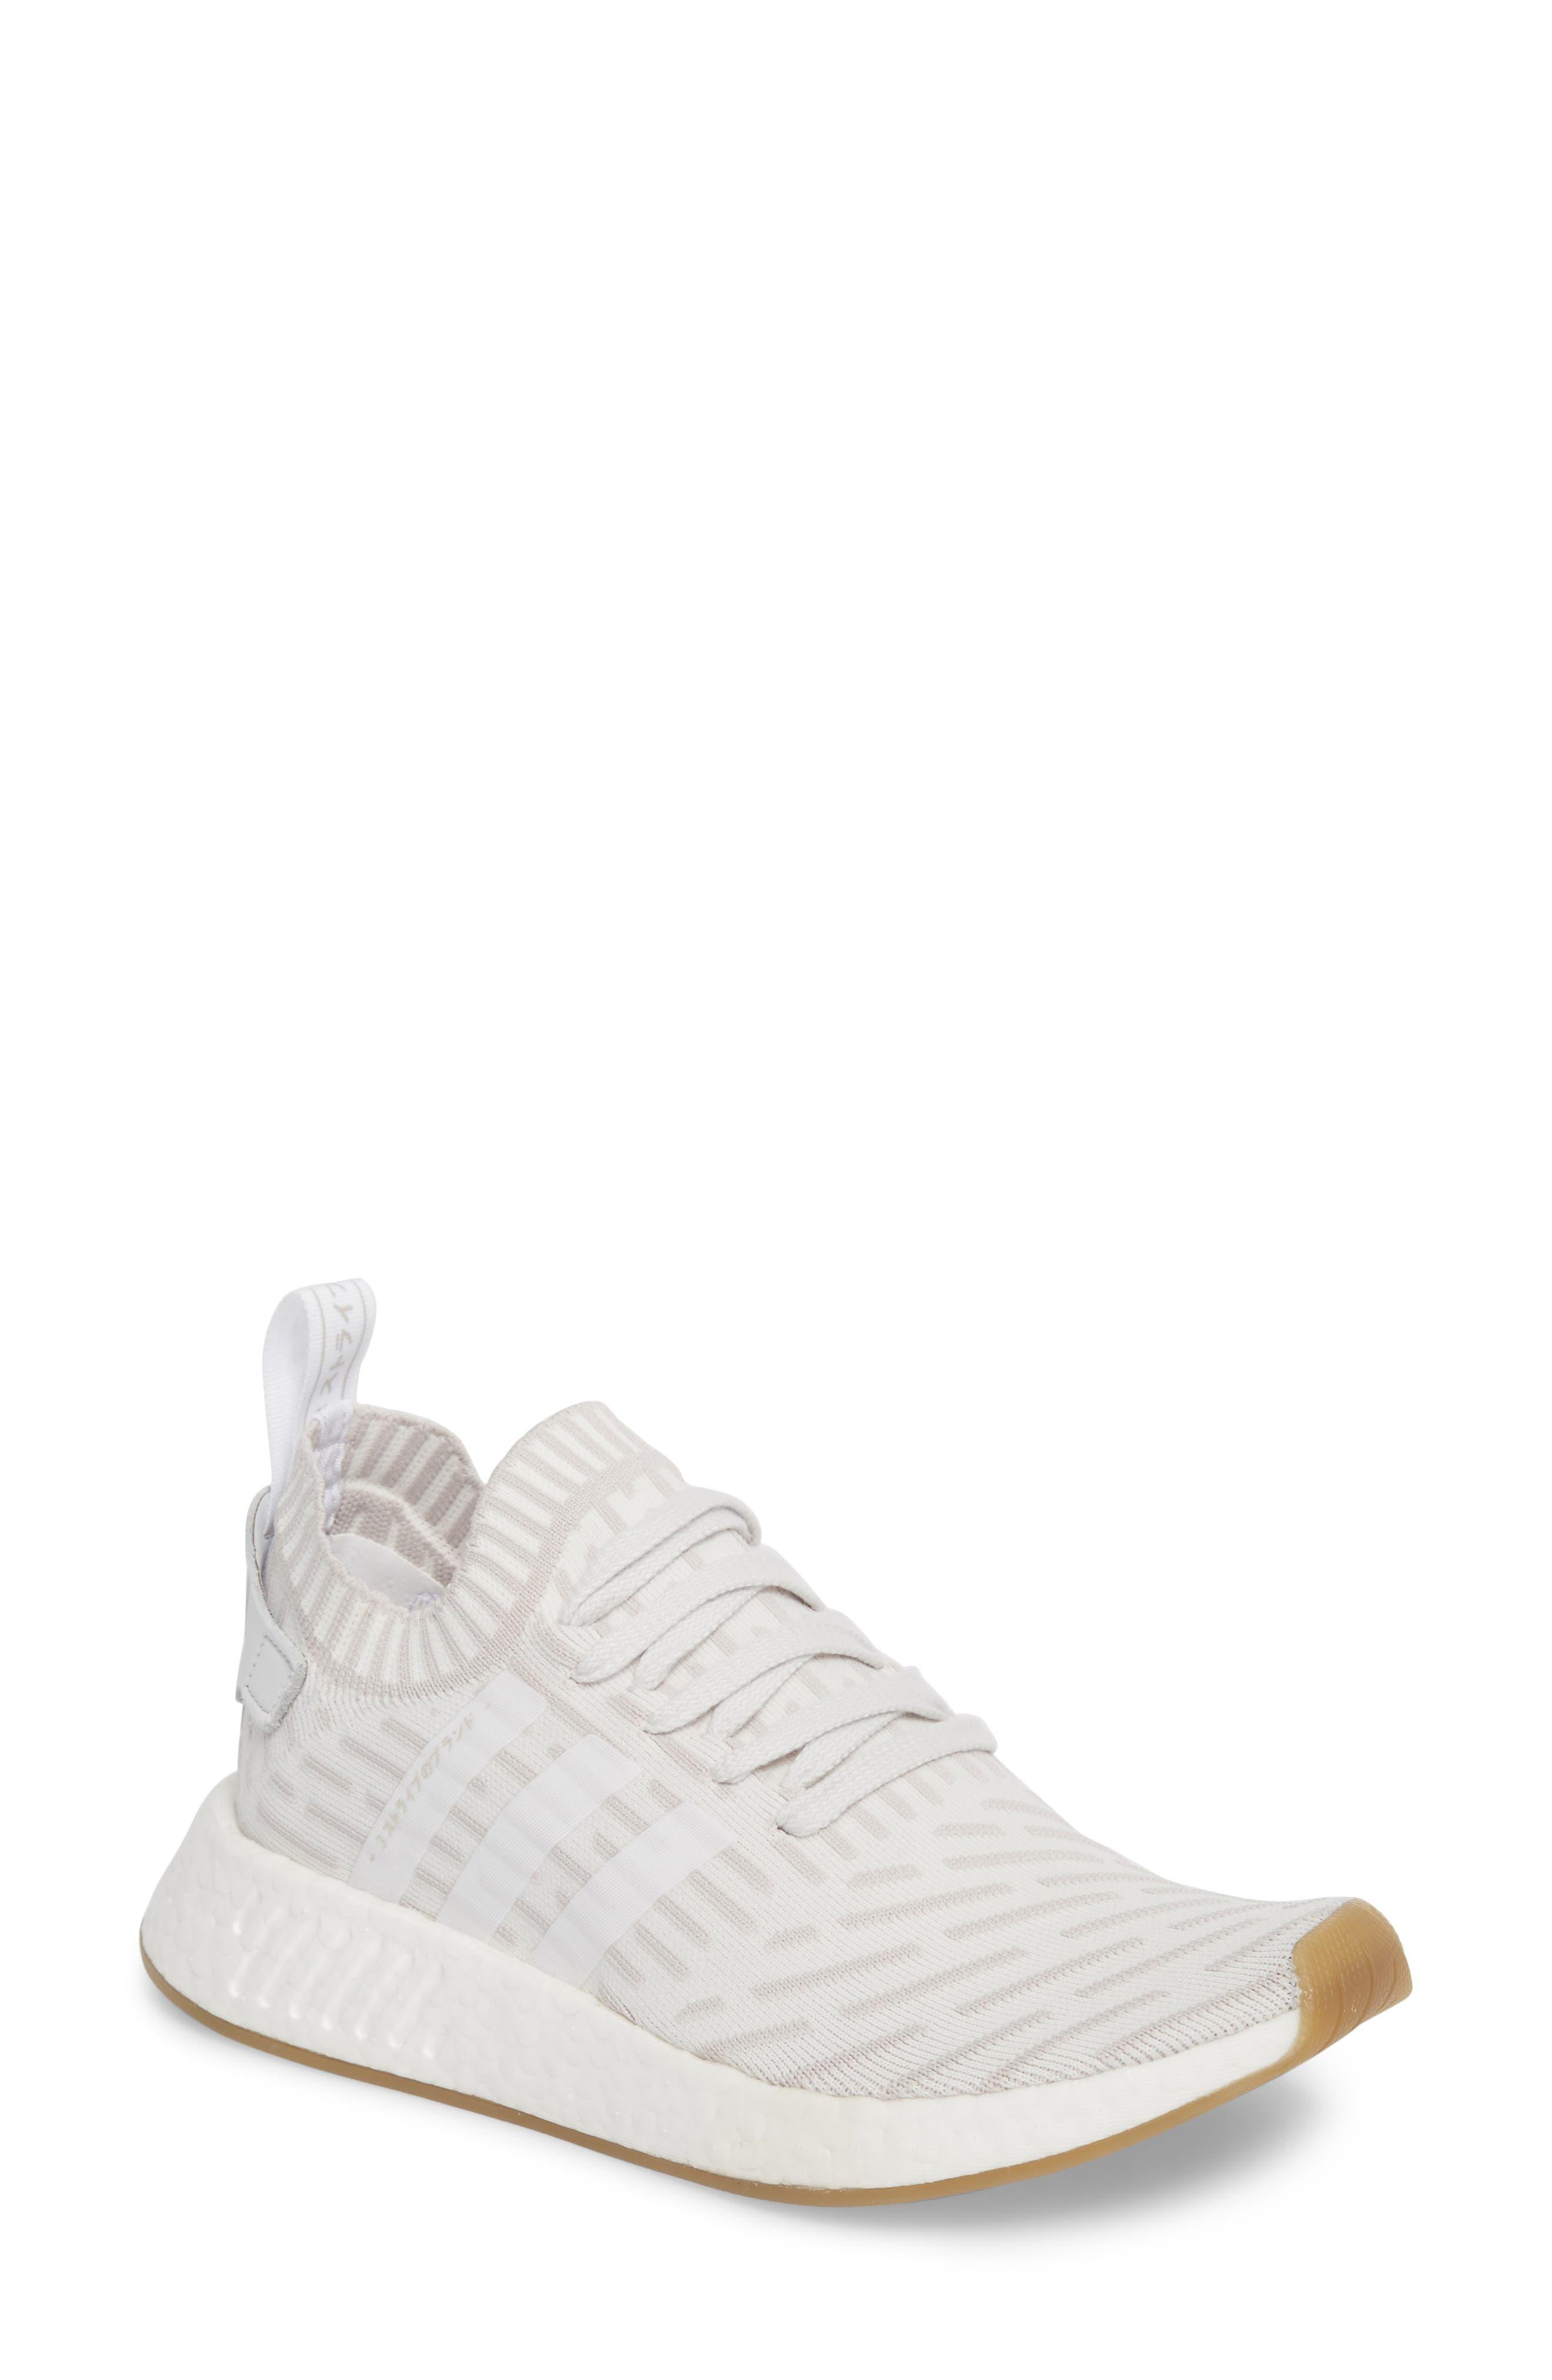 adidas NMD R2 Primeknit Athletic Shoe (Women)